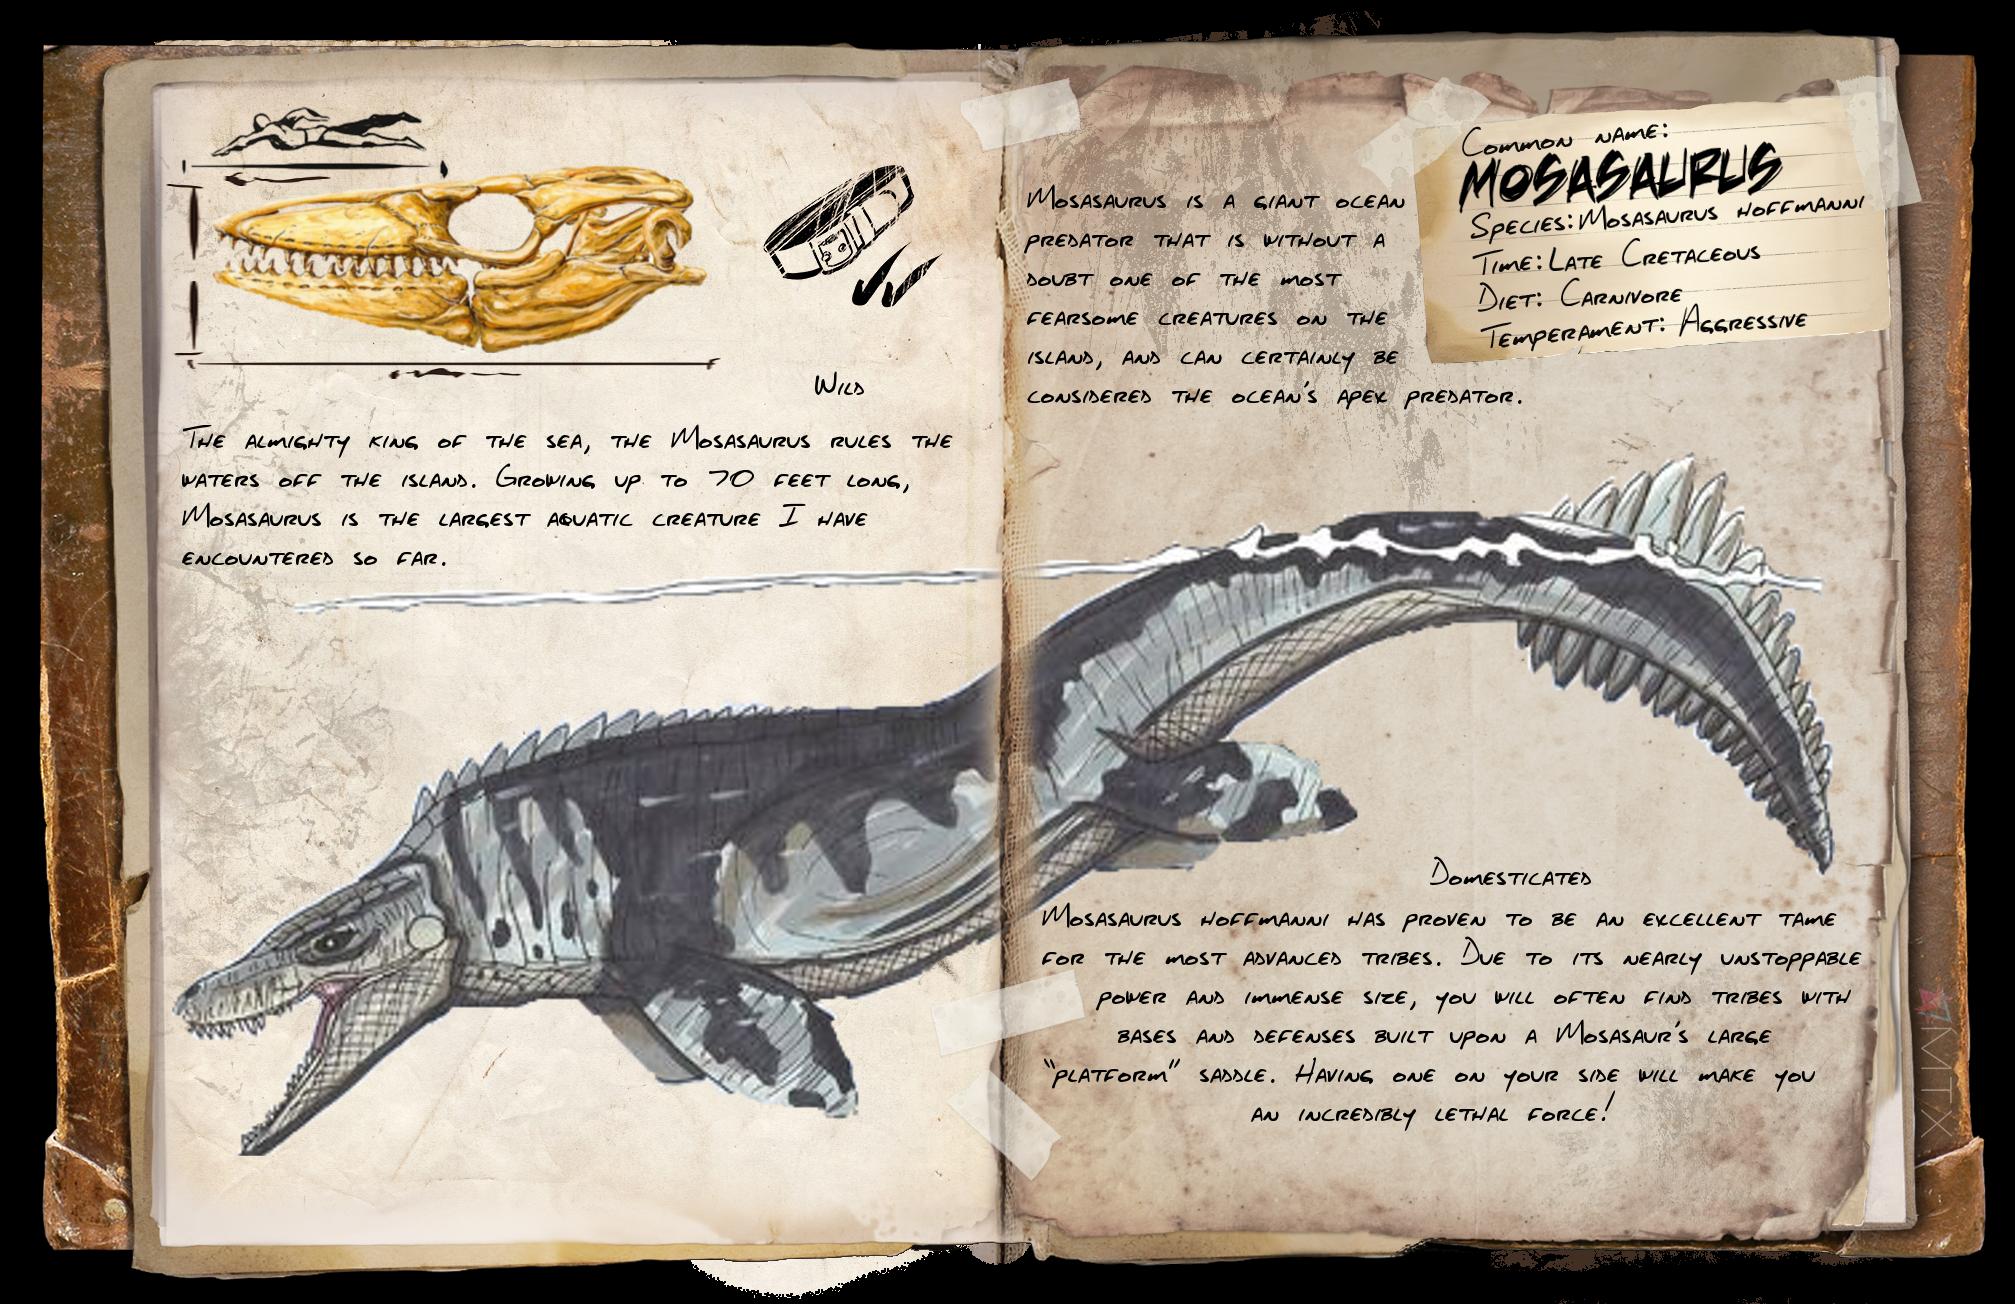 steam community dossier mosasaurus. Black Bedroom Furniture Sets. Home Design Ideas